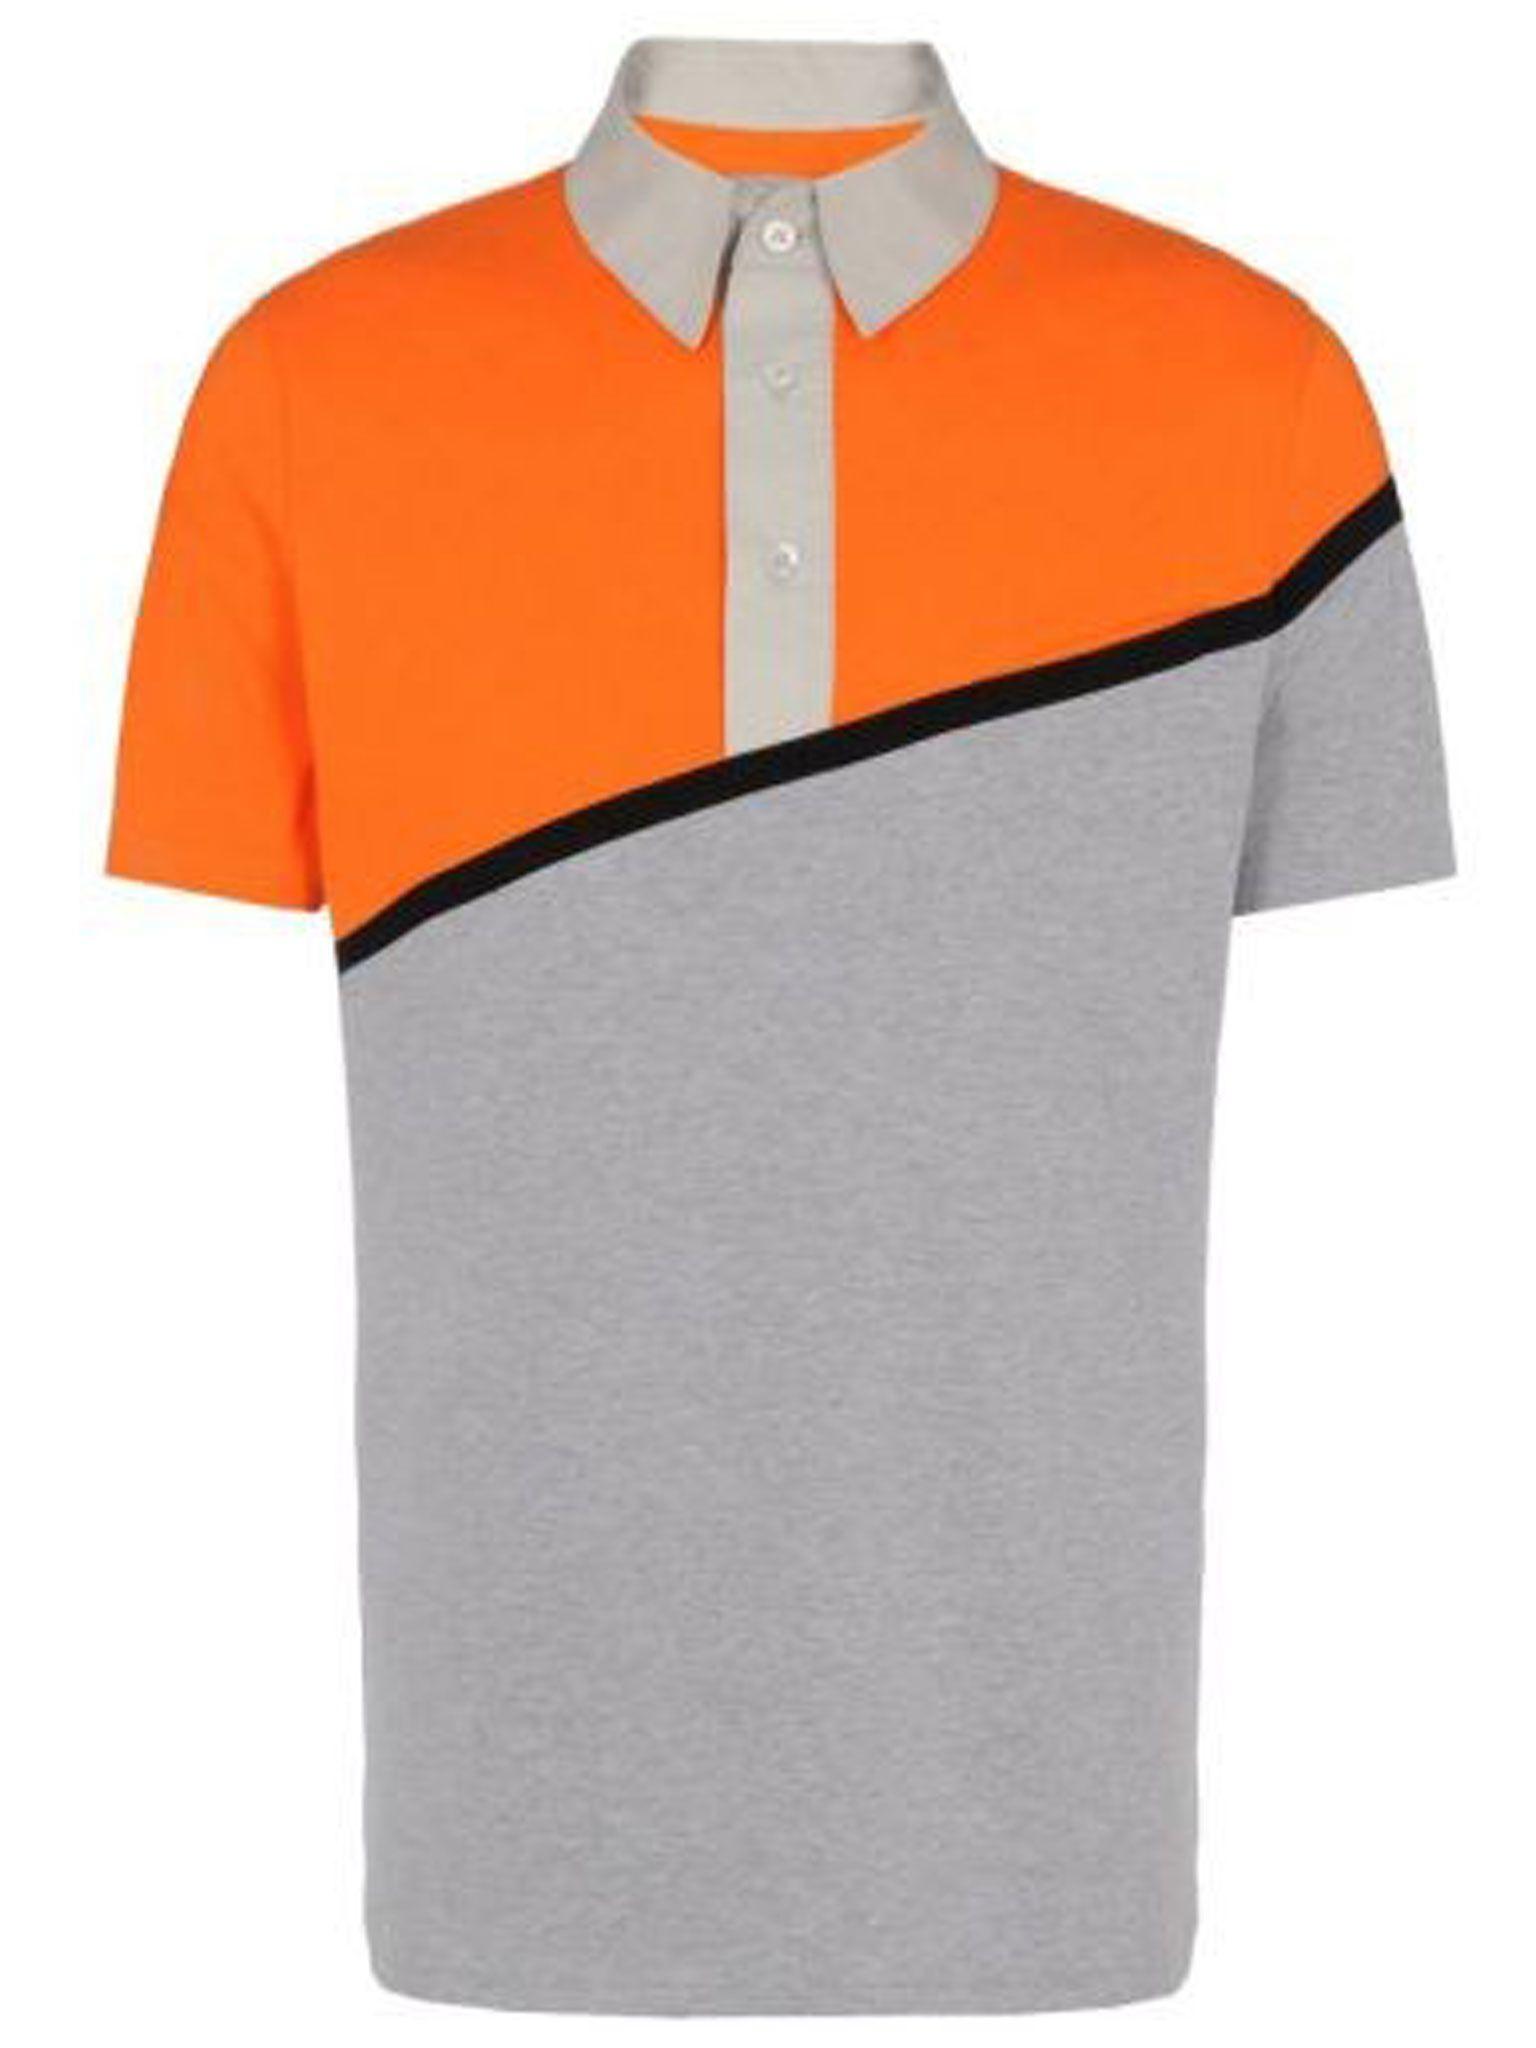 Kết quả hình ảnh cho polo shirt design ideas | Tshirt | Pinterest ...